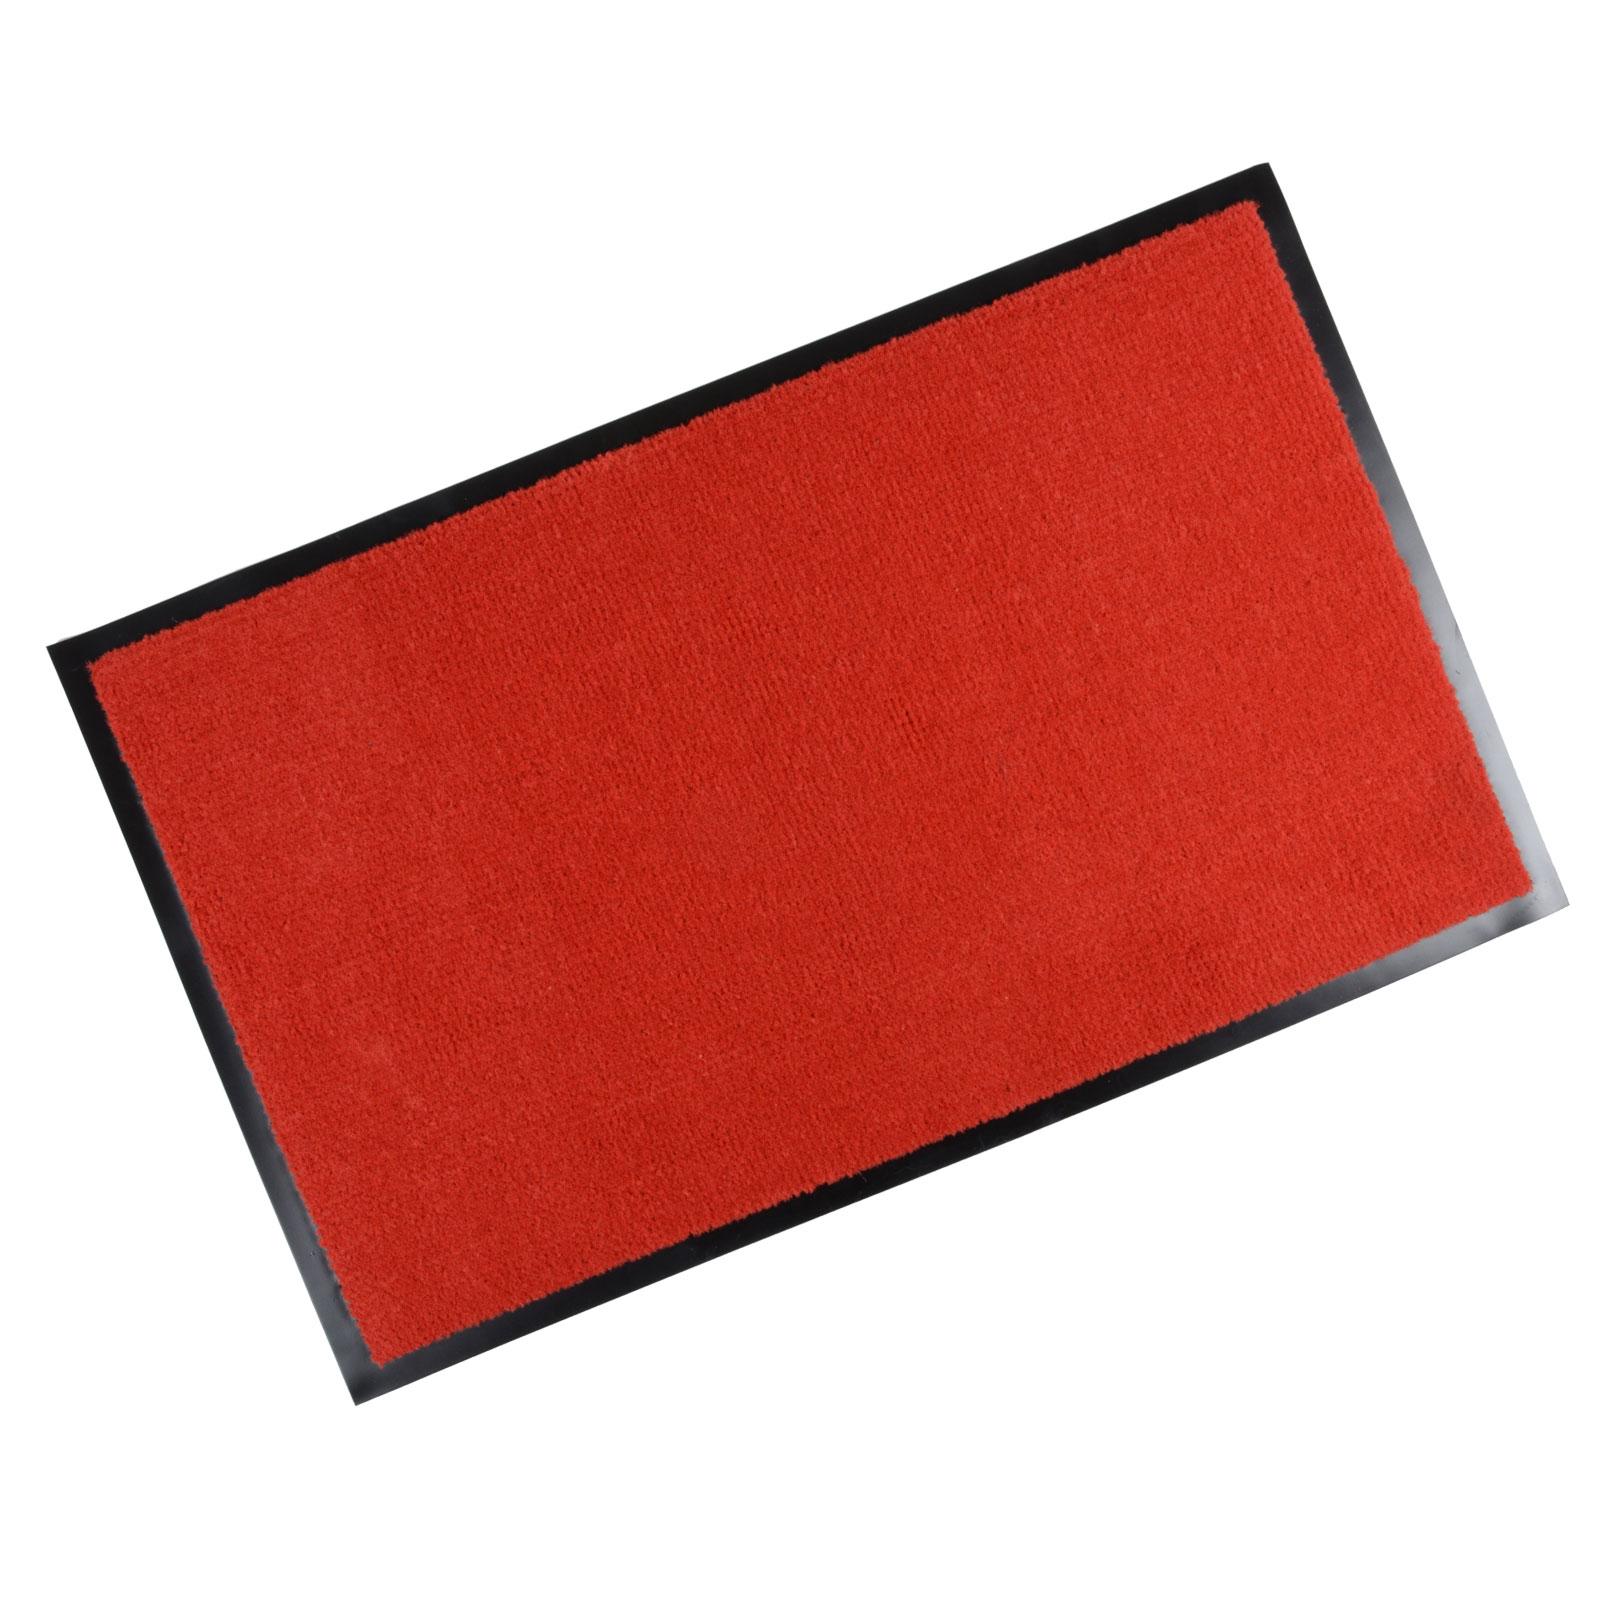 Jml Small Magic Carpet Door Bath Mat Home Welcome Durable